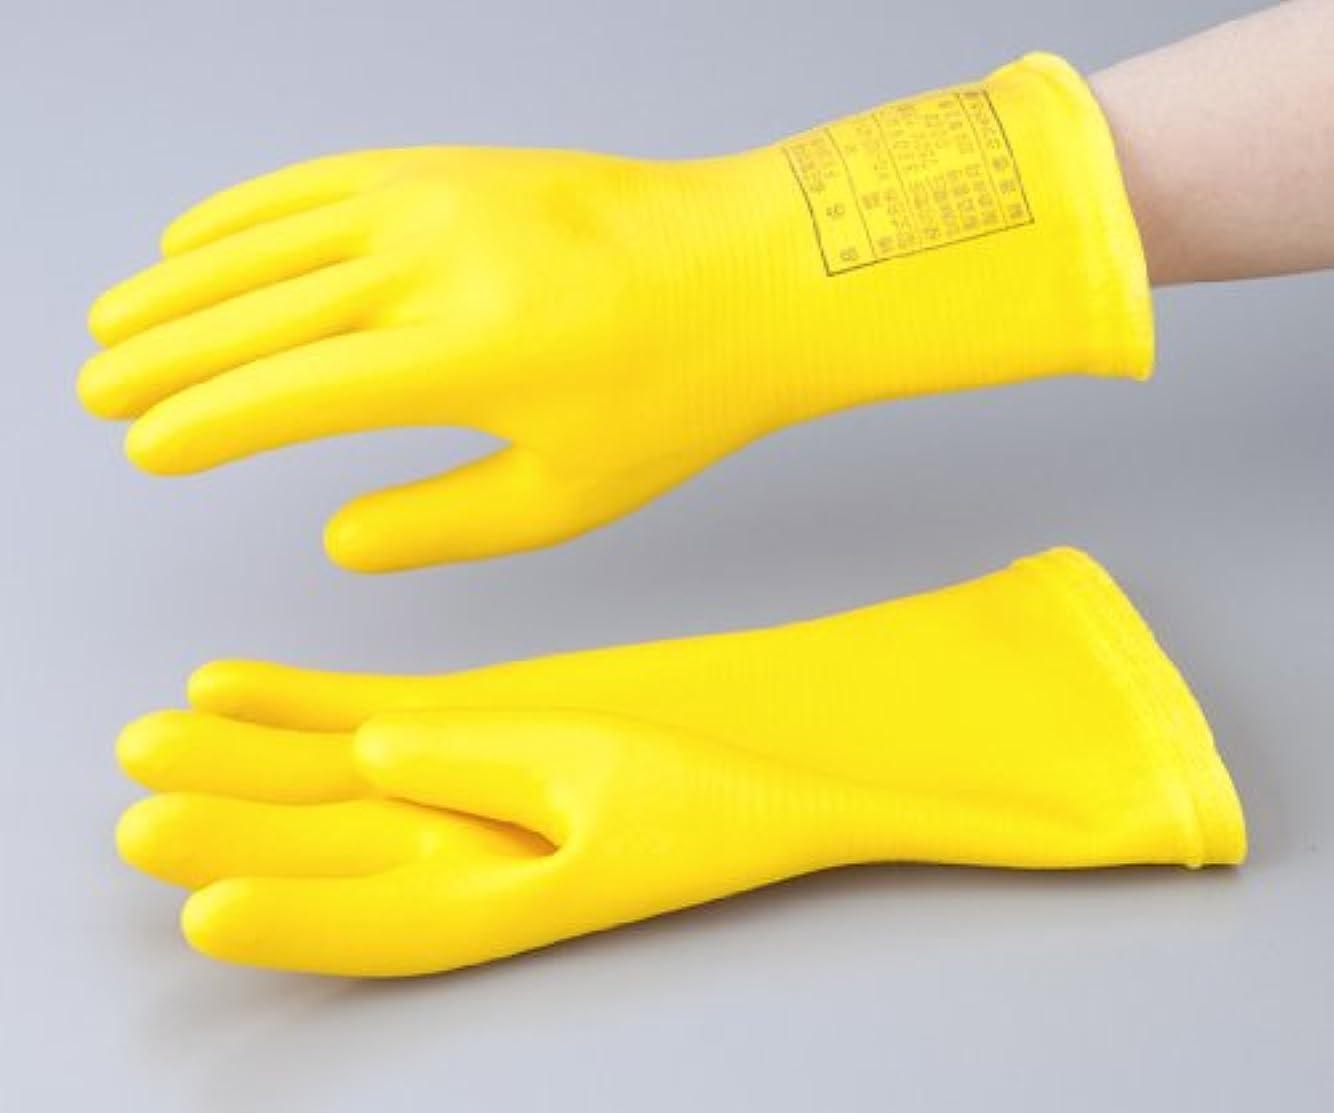 不倫ドラフト民主主義1-3686-03低圧用発泡手袋M